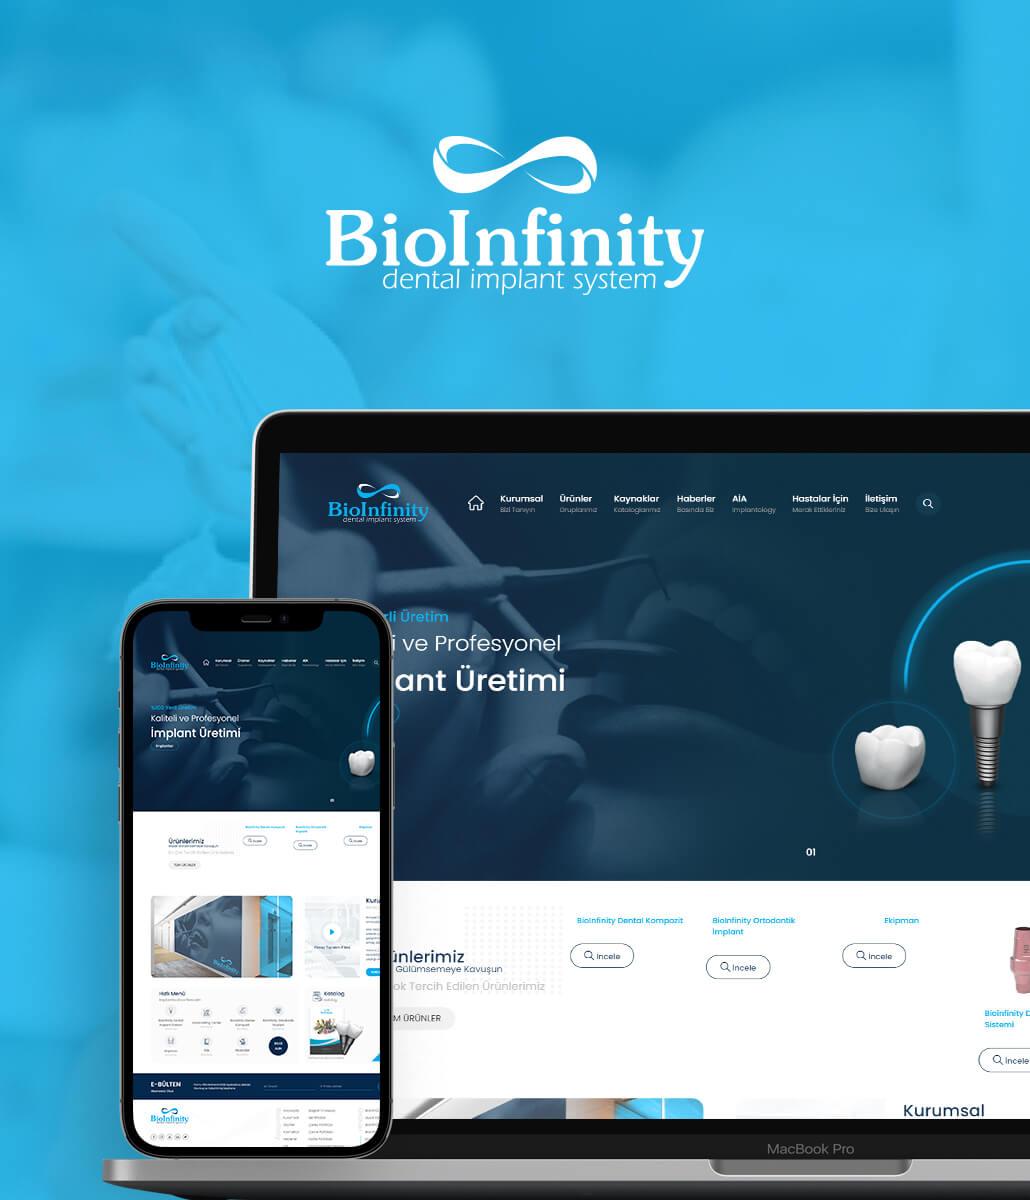 Bioinfinity Implants Kurumsal Web Sitesi